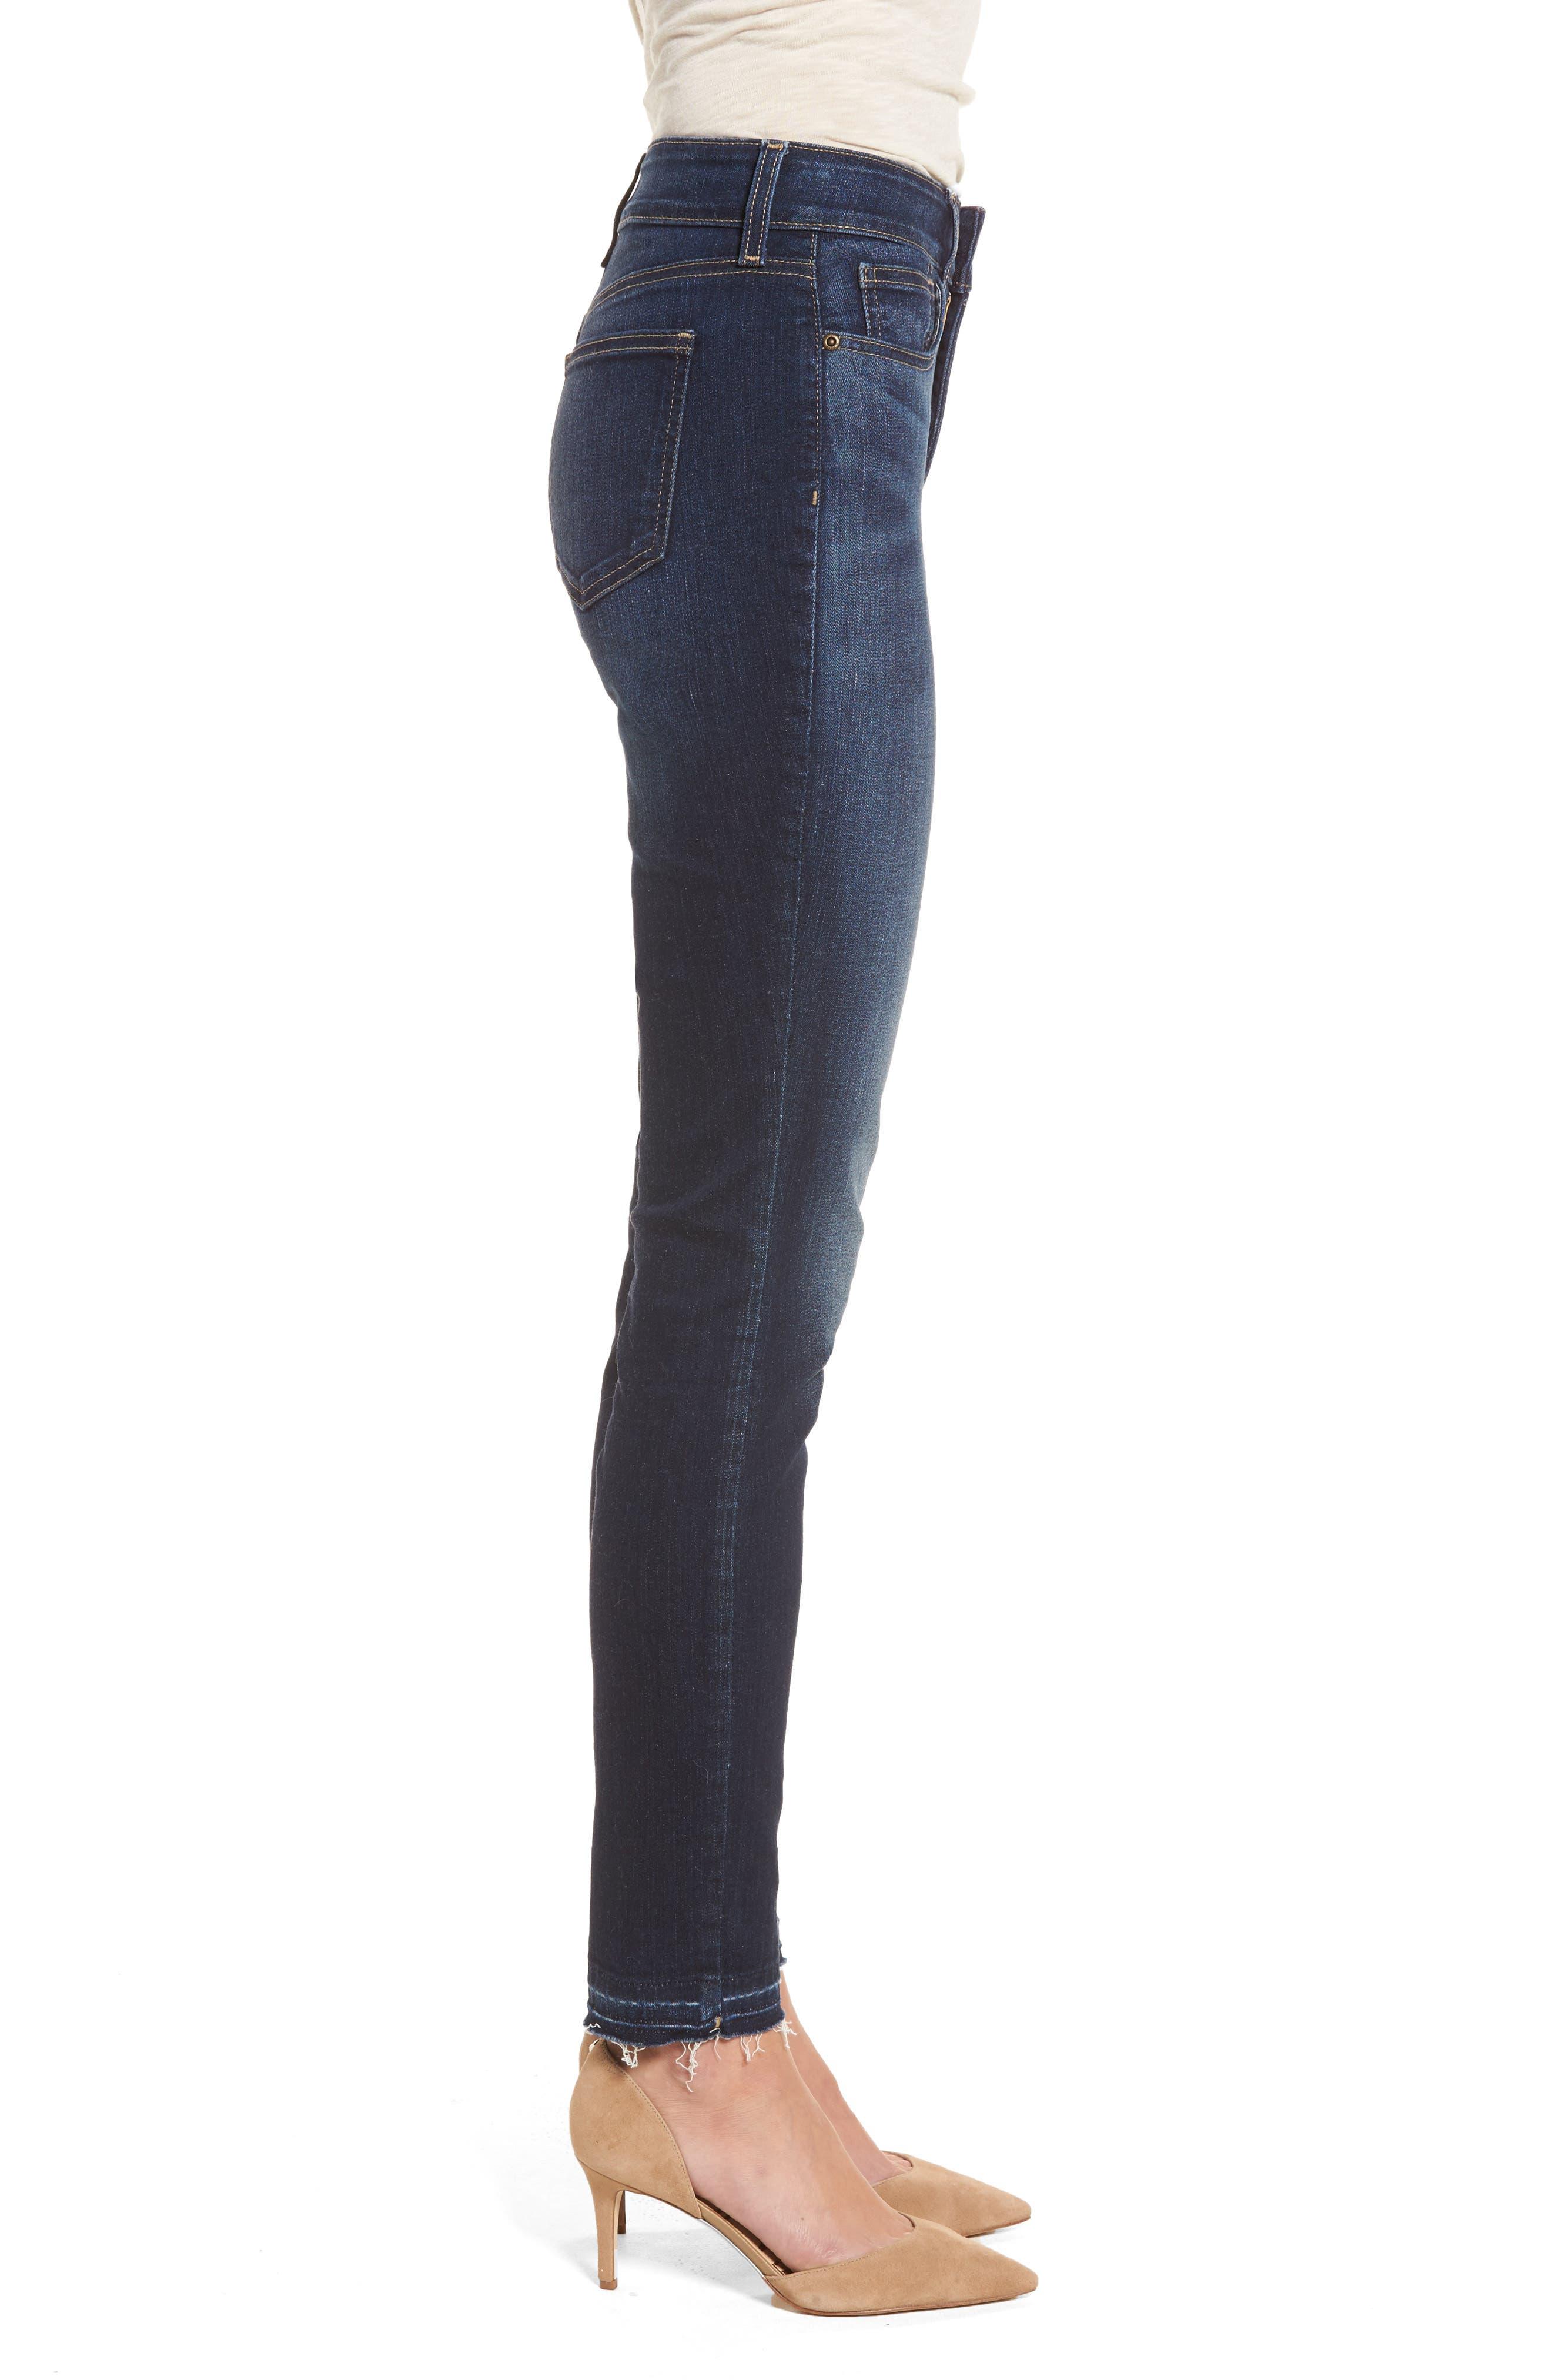 Alina Release Hem Stretch Ankle Jeans,                             Alternate thumbnail 3, color,                             421